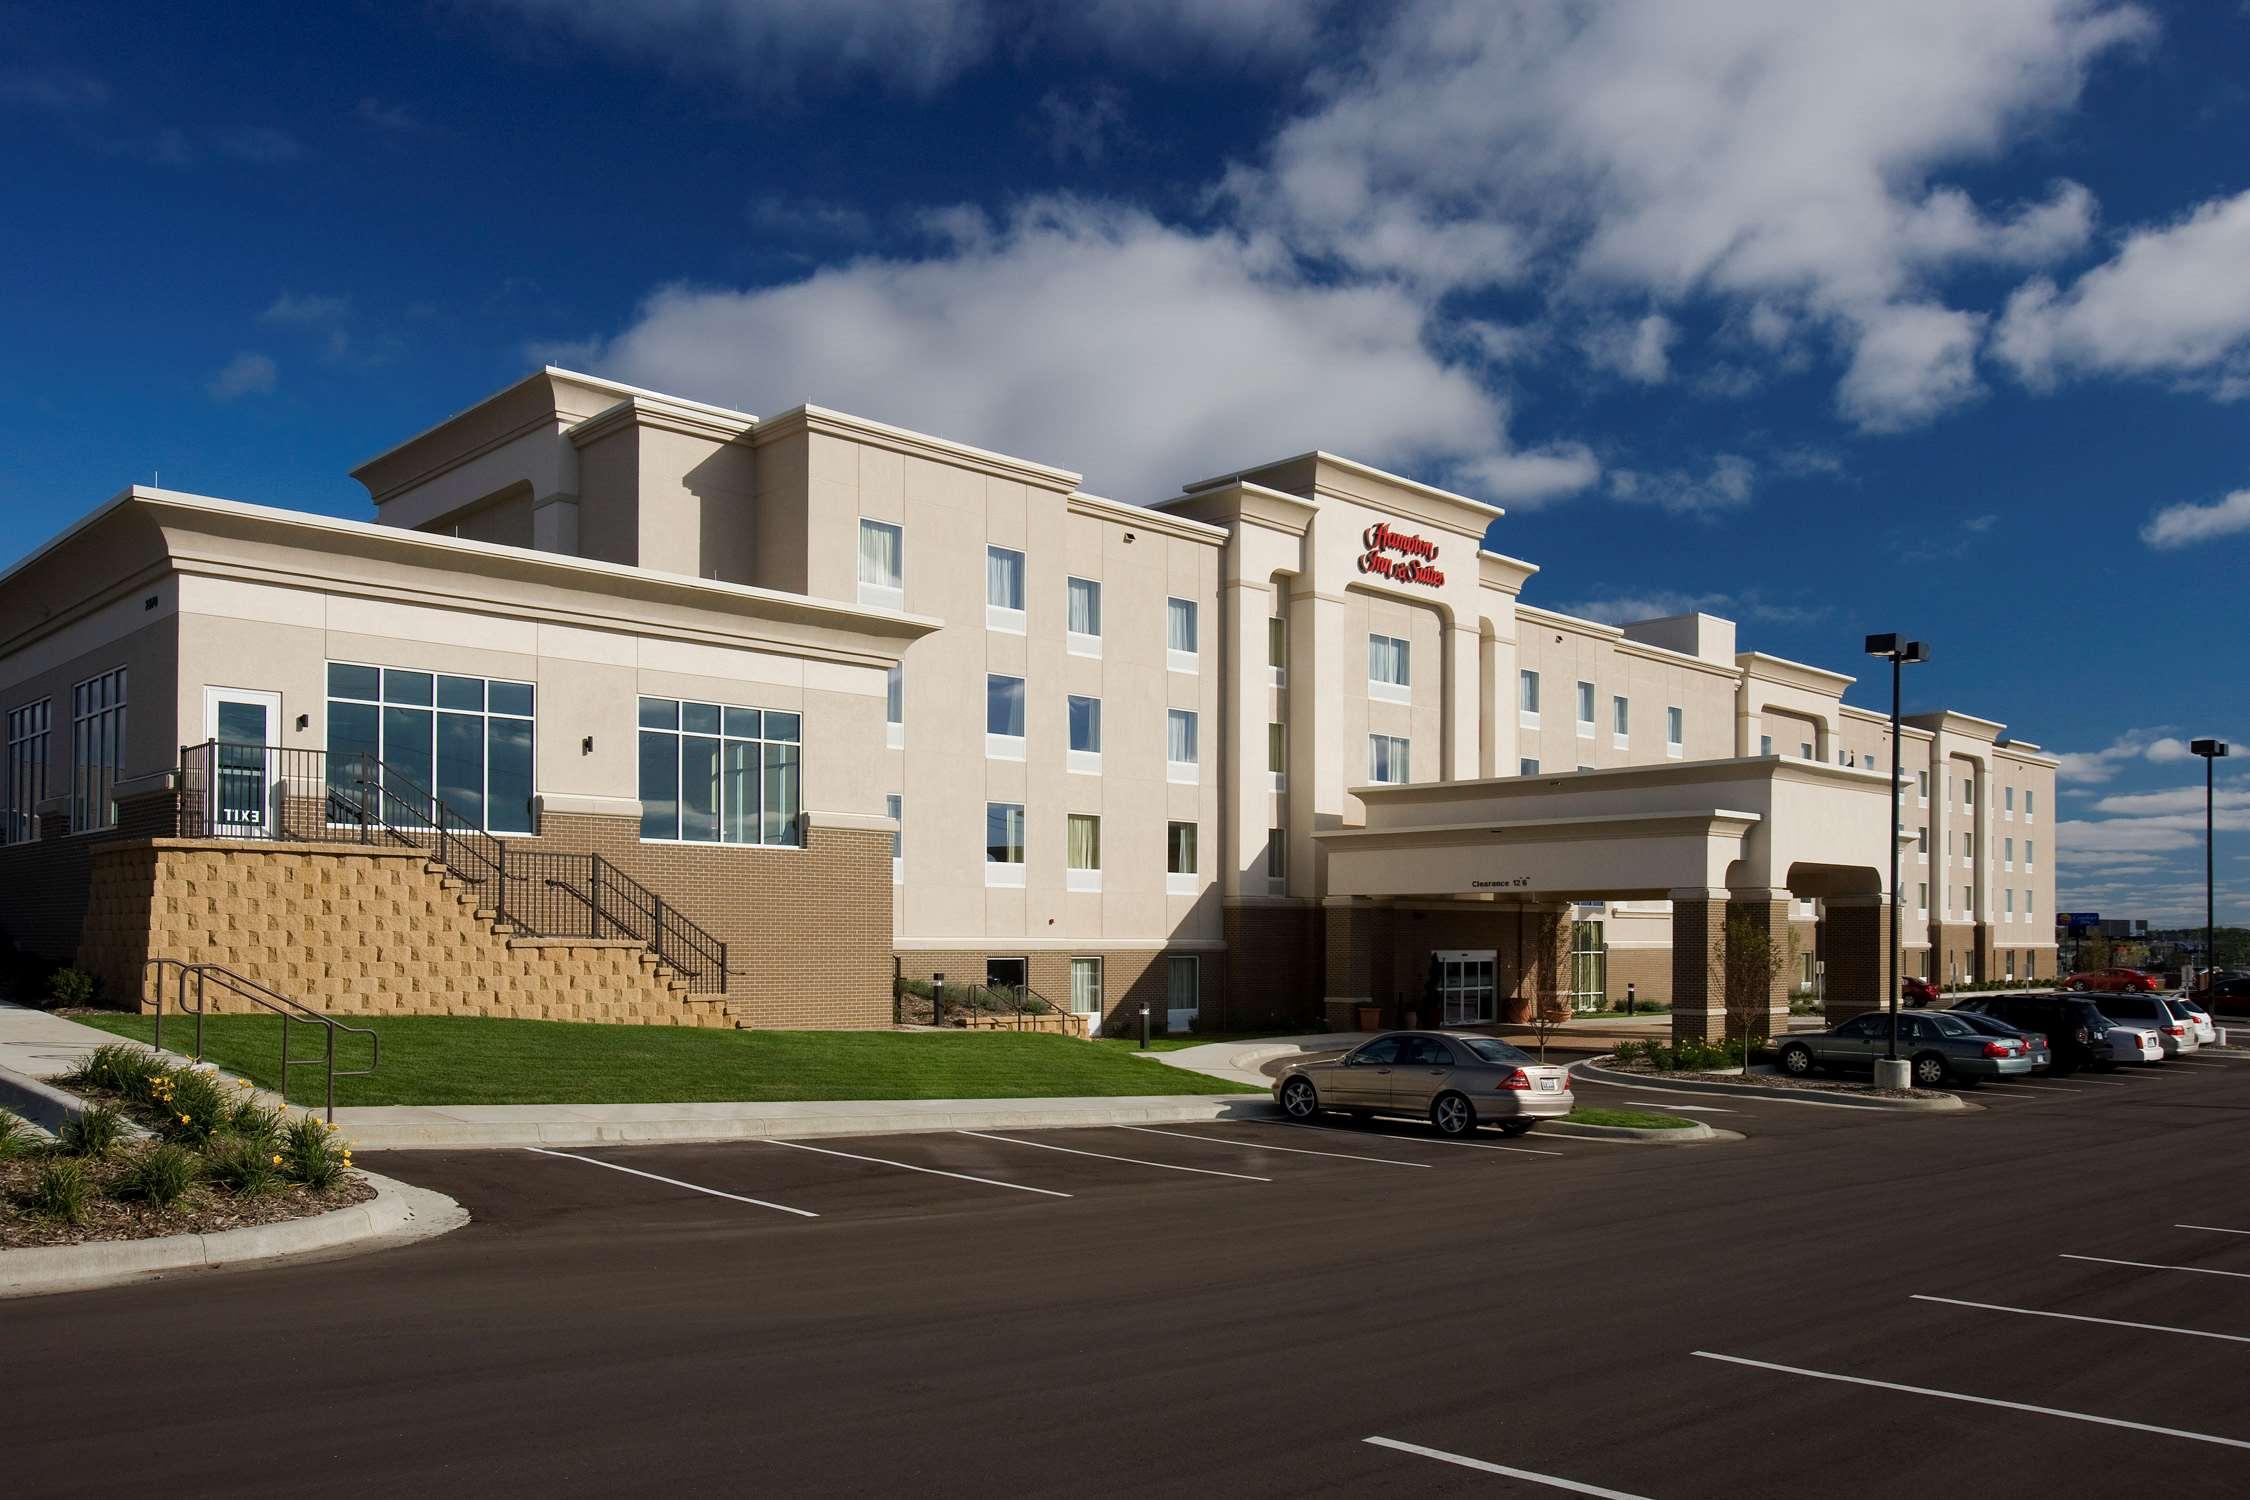 Hampton Inn & Suites Rochester-North image 1